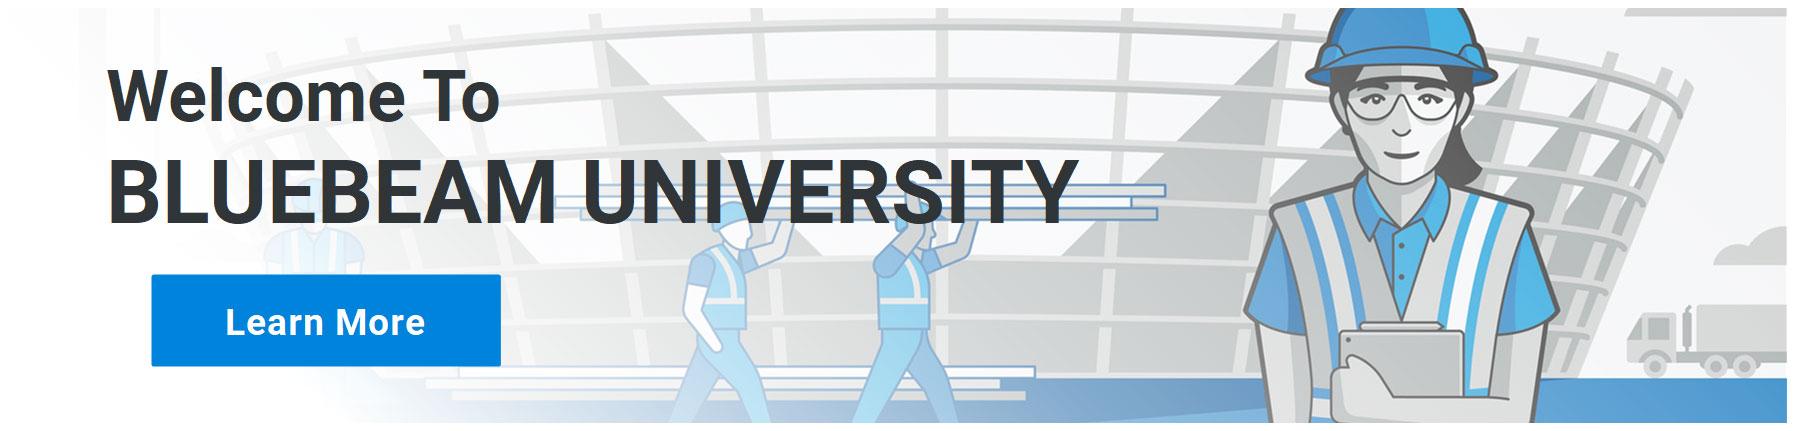 Bluebeam University